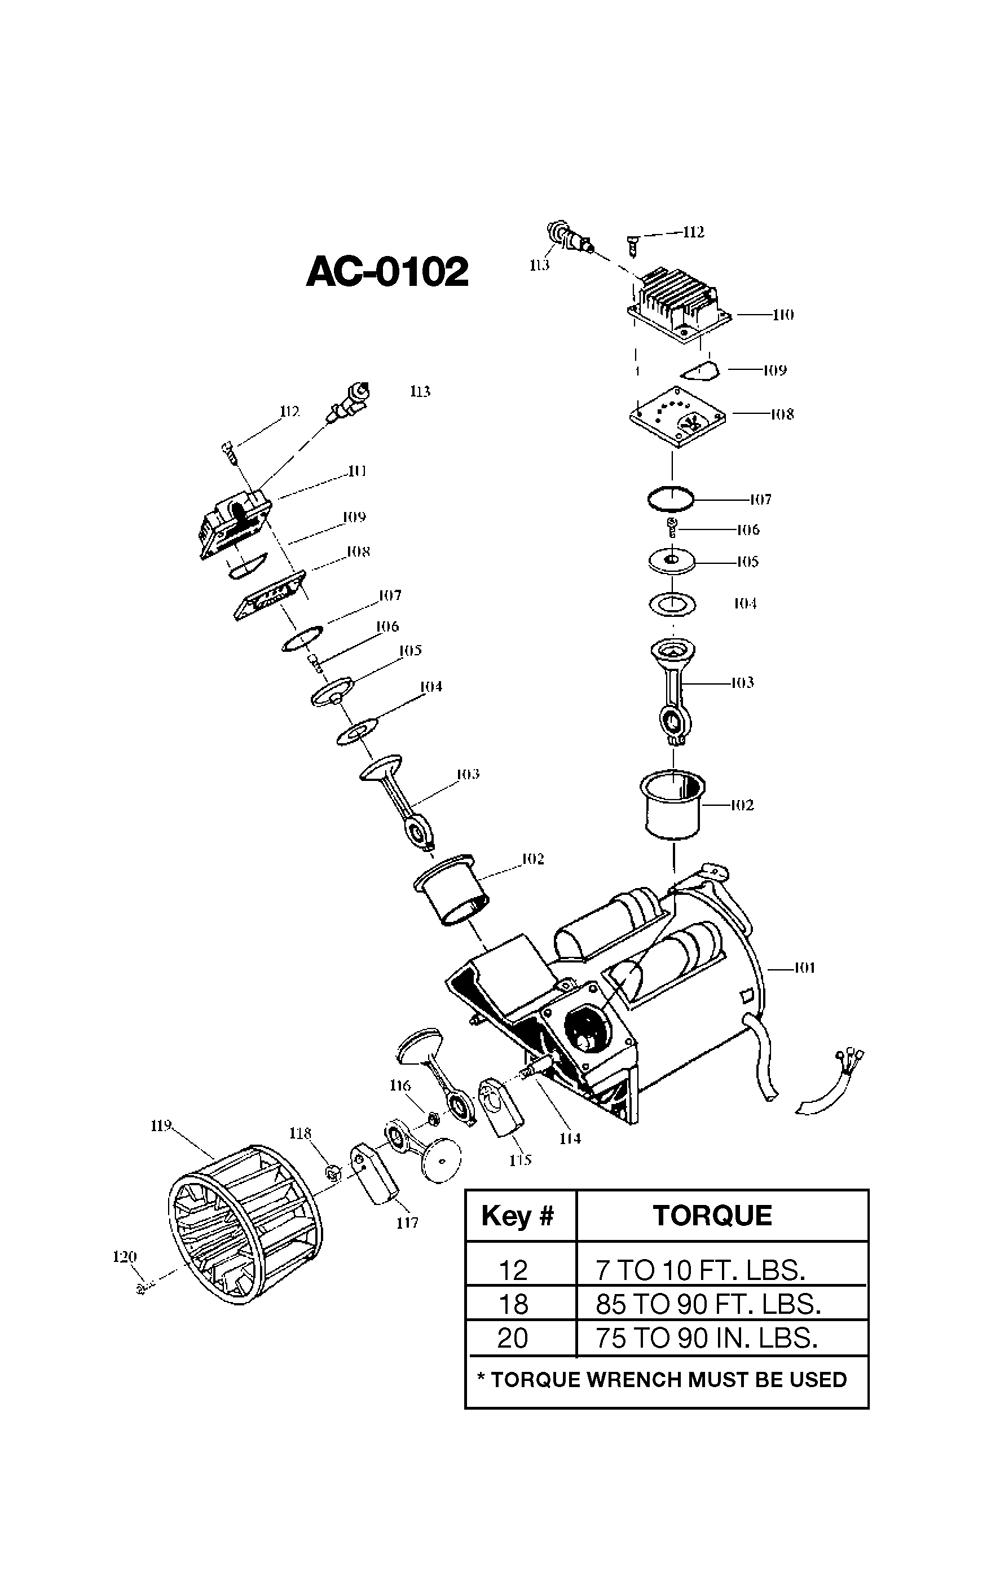 IRC500TVE30-BlackandDecker-T2-PB-1Break Down